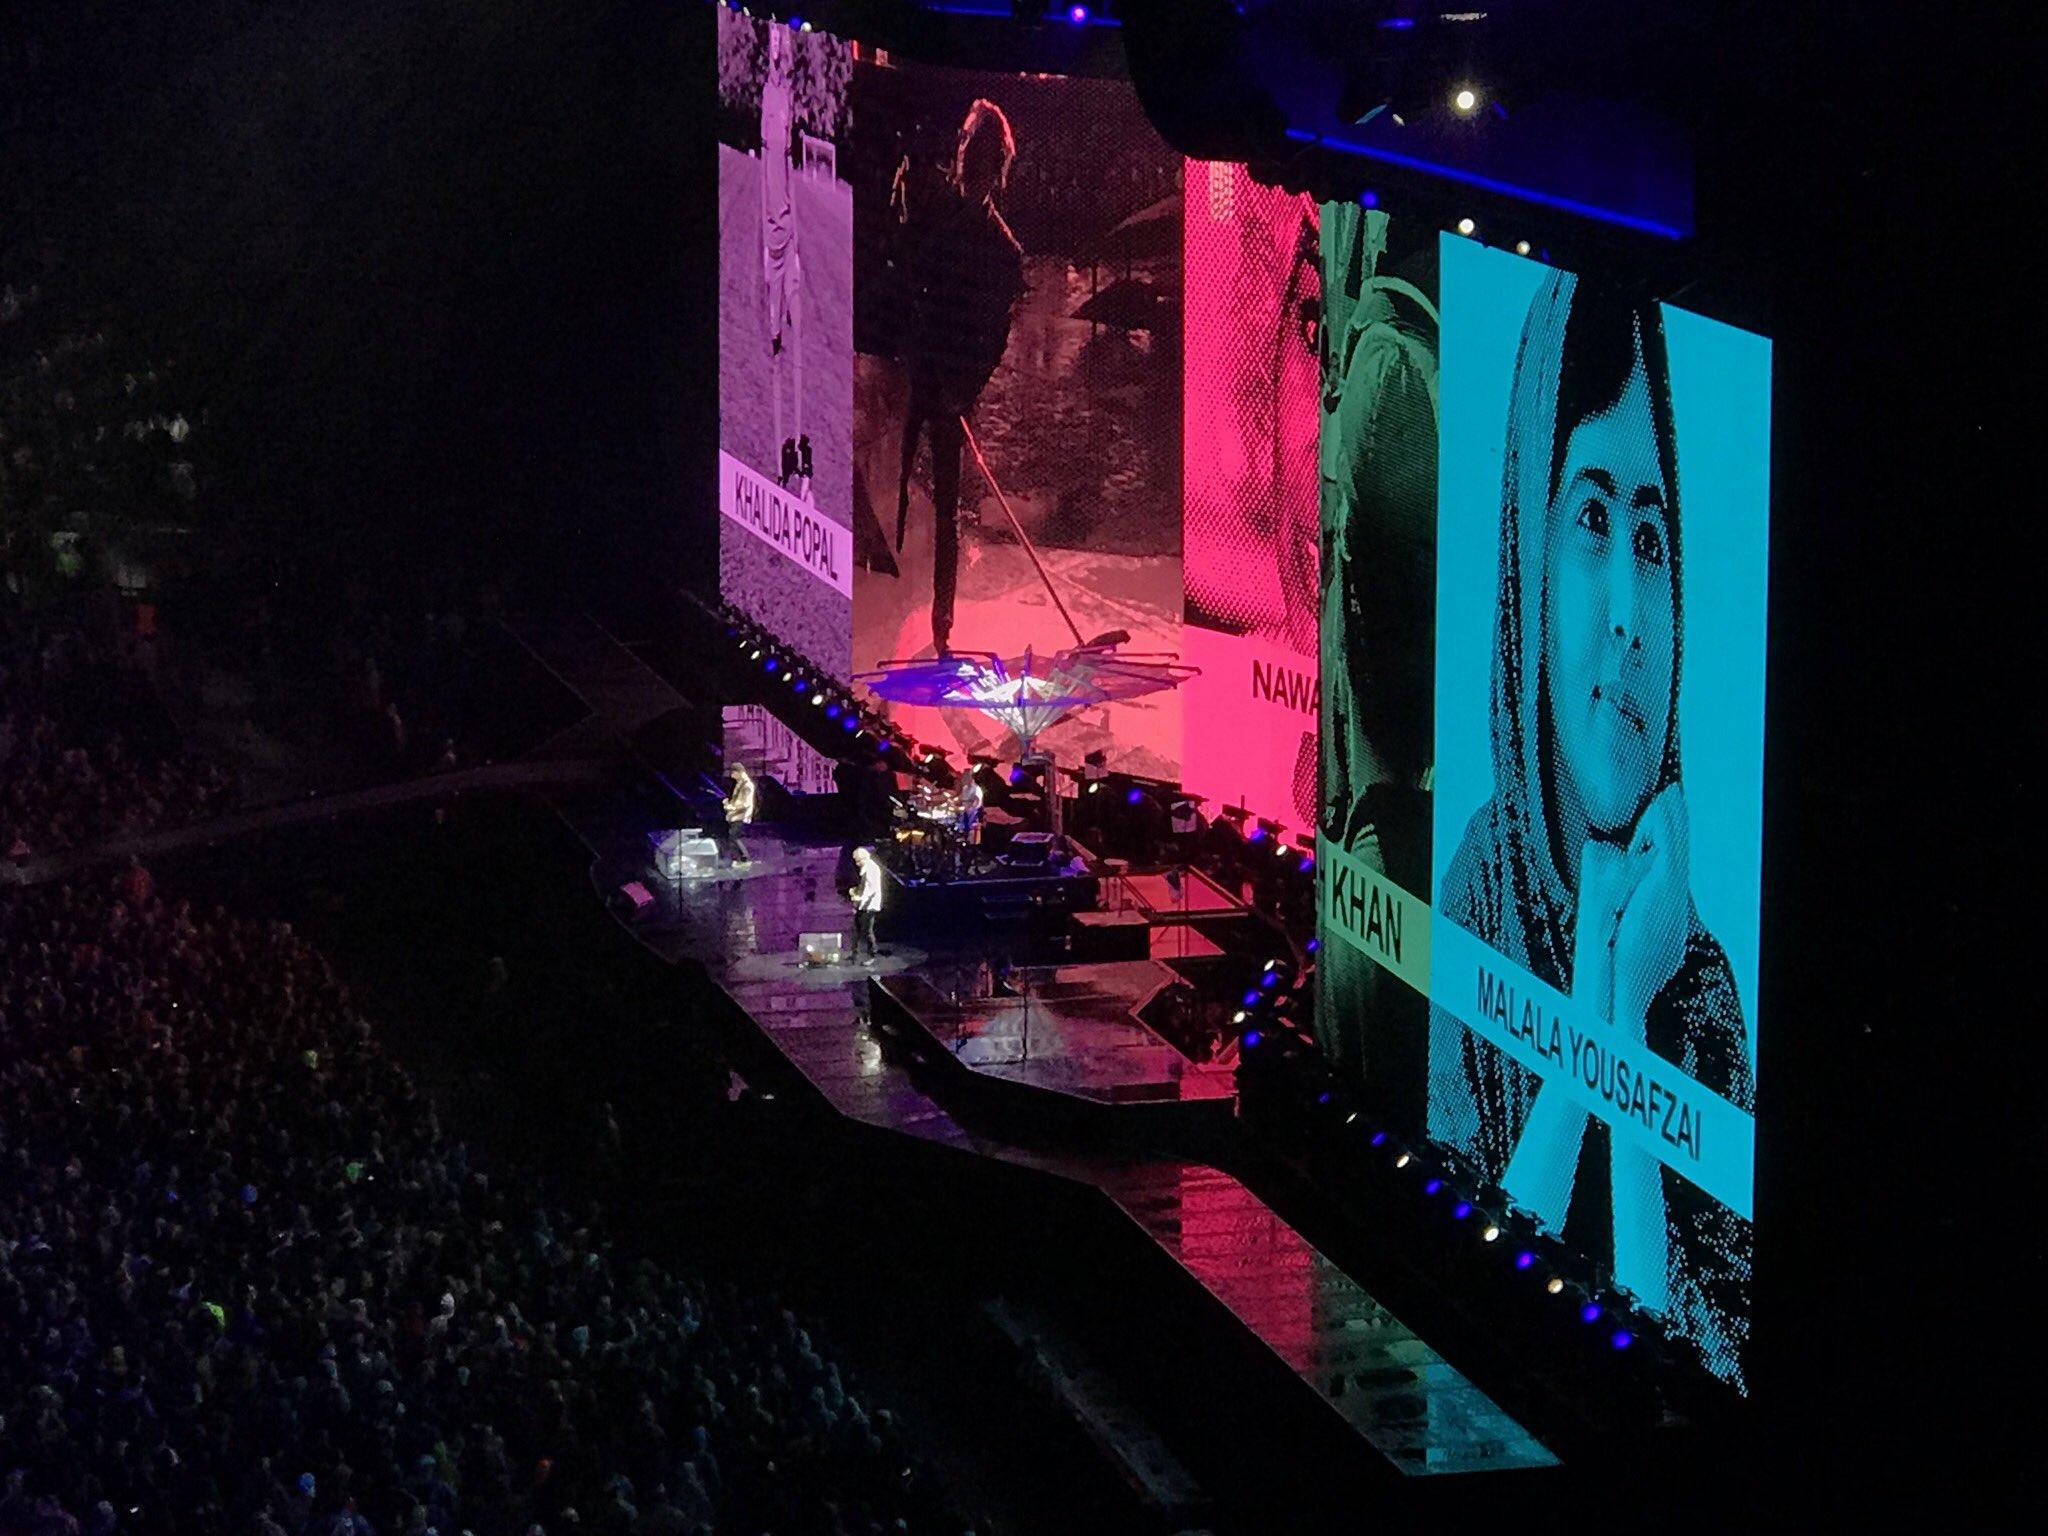 Malala Yousafzai (Happy Birthday!), Poly Styrene, Emma Watson und: Angela Merkel. Und viele mehr.